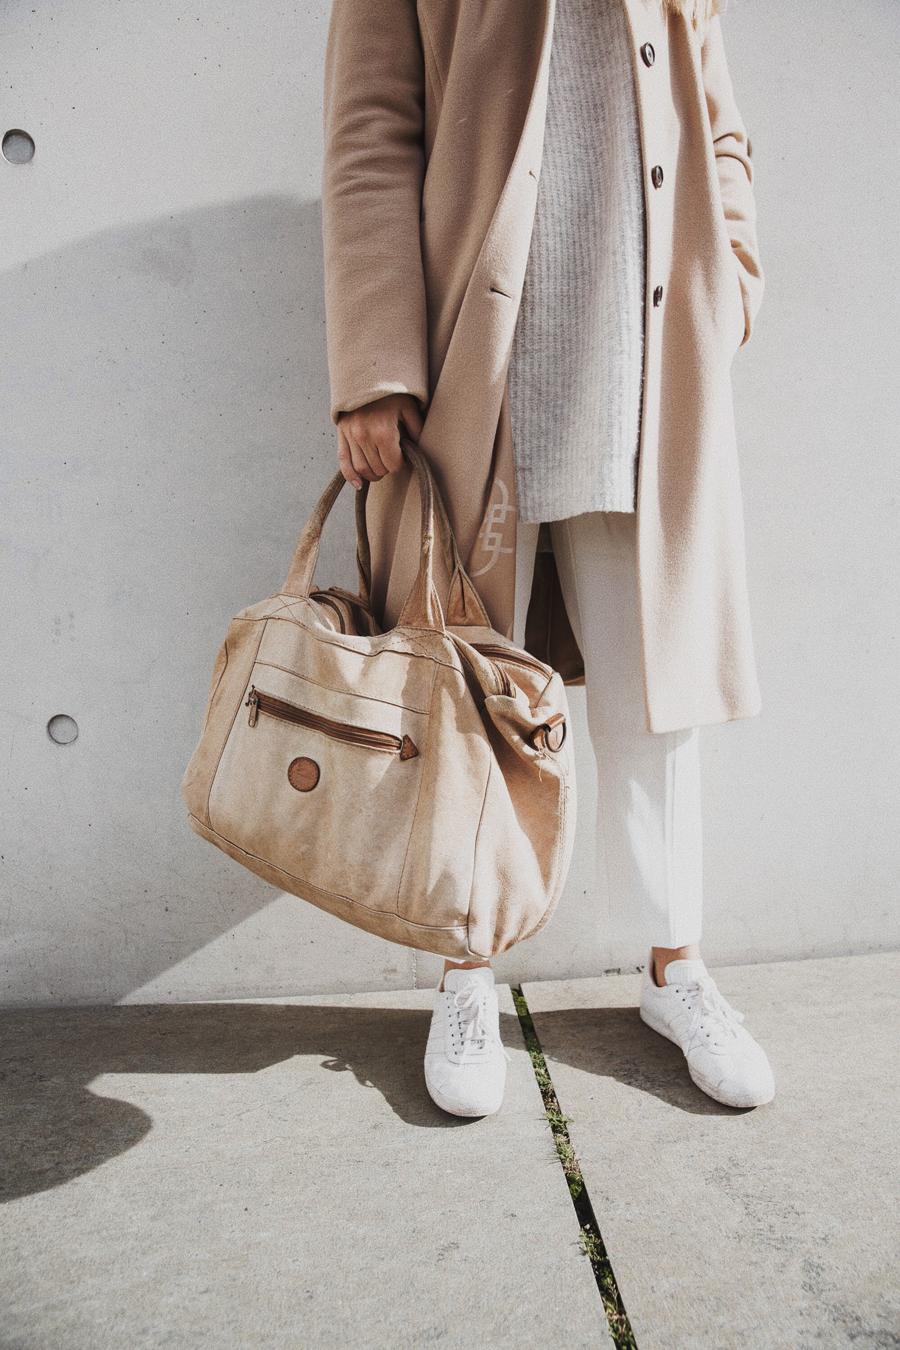 streetstyle-fashionblogger-camel-coat-romina-mey-details